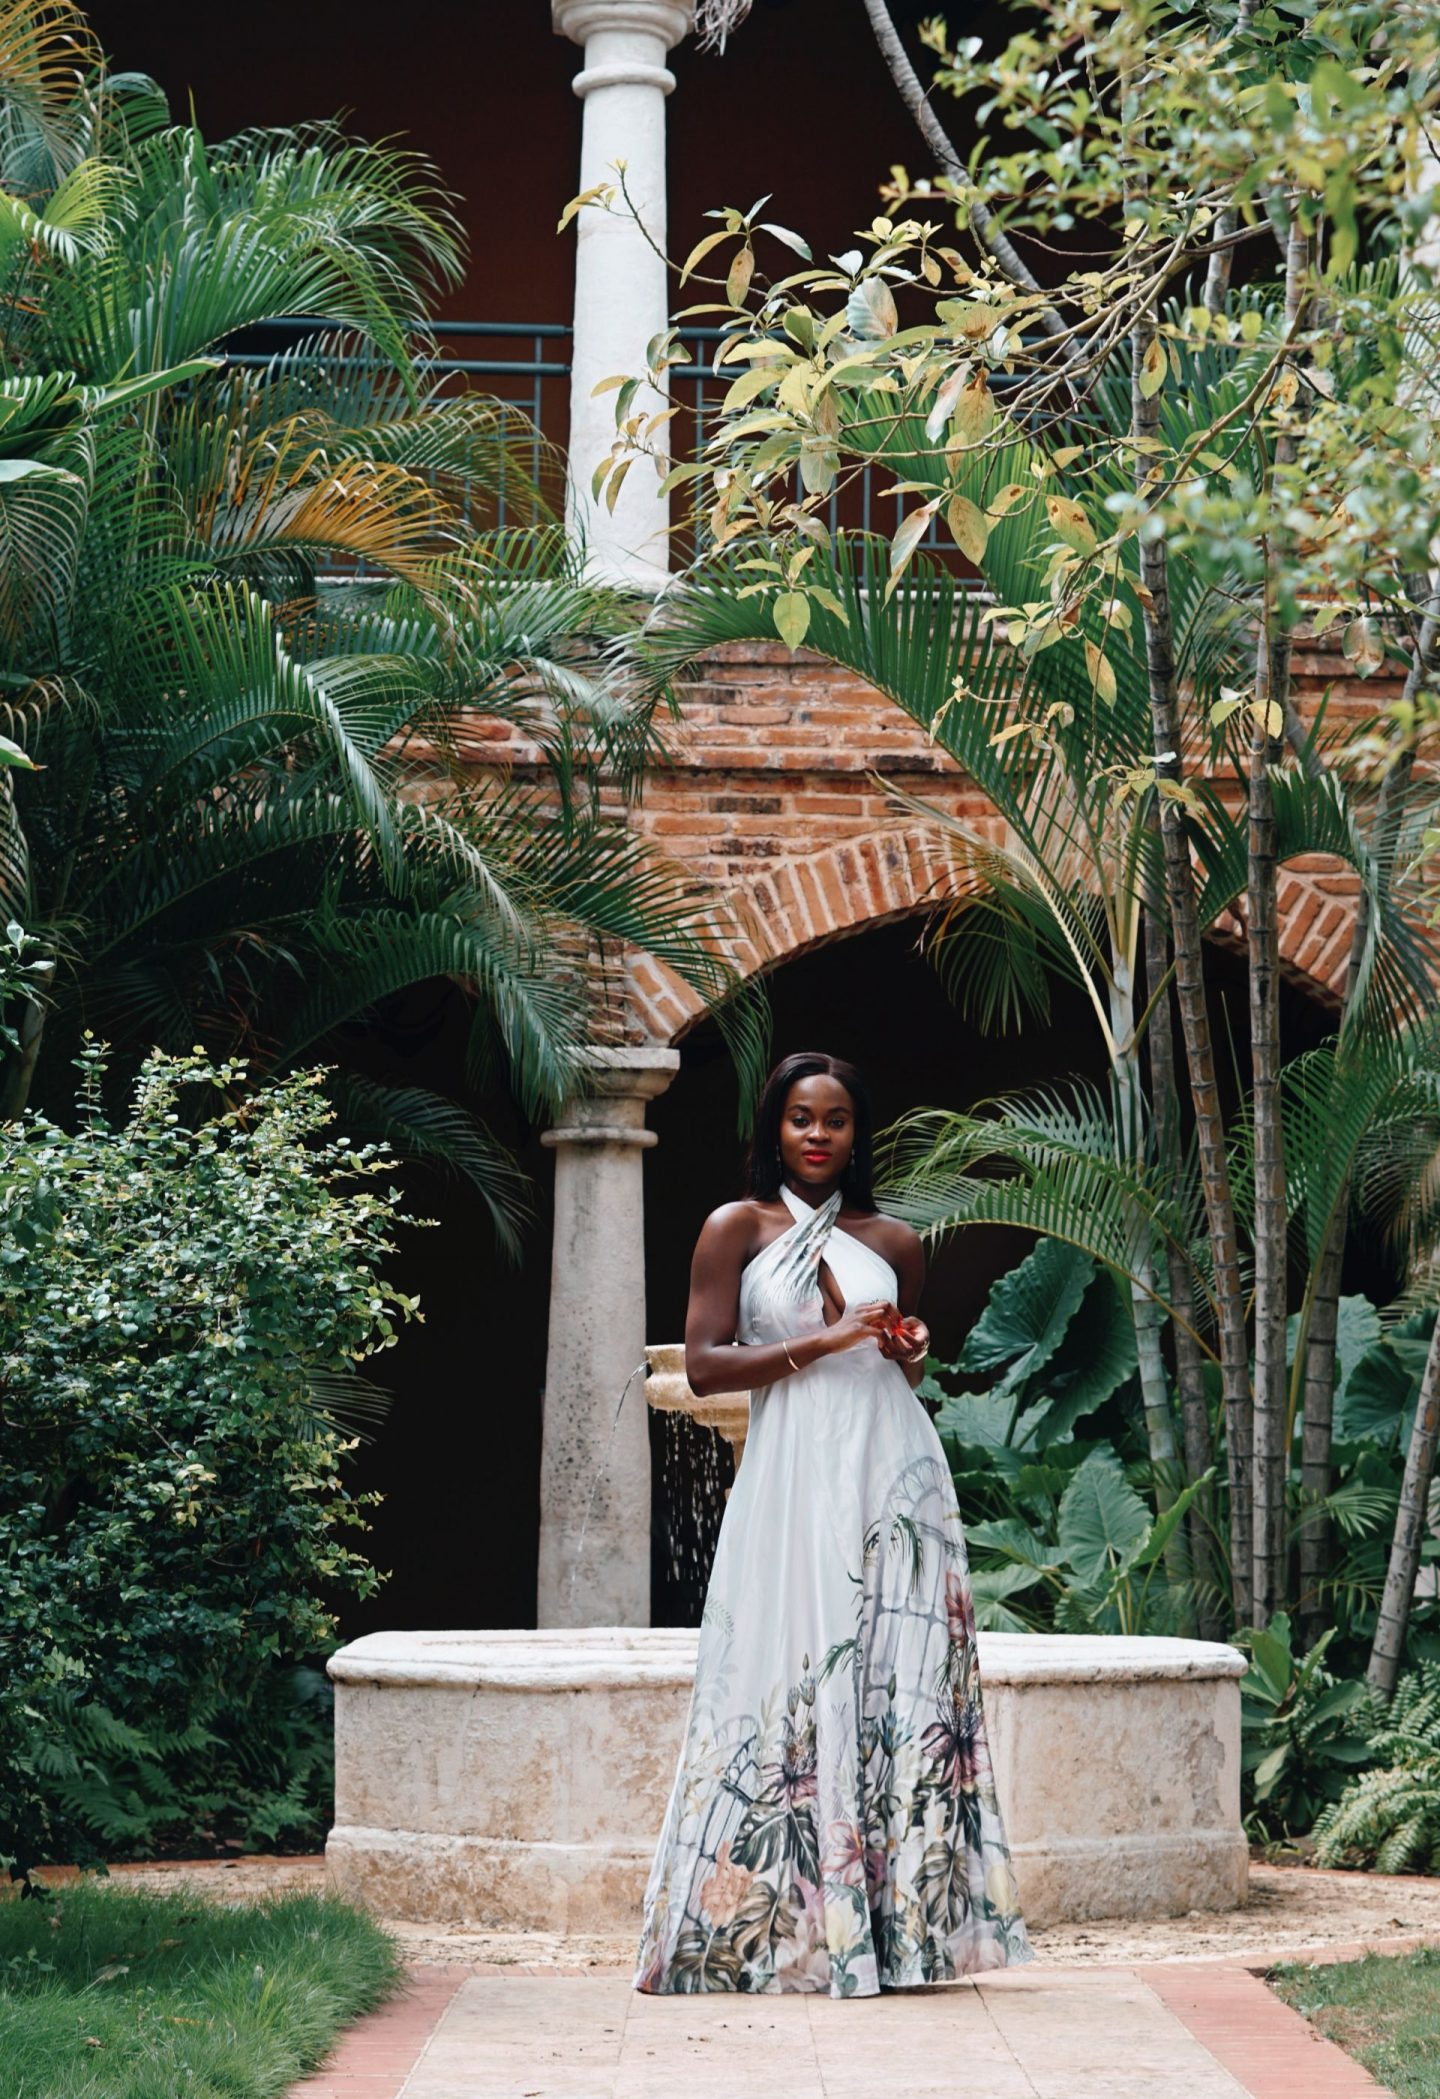 Cranberry Tantrums: Travel Guide for Santo Domingo, Dominican Republic